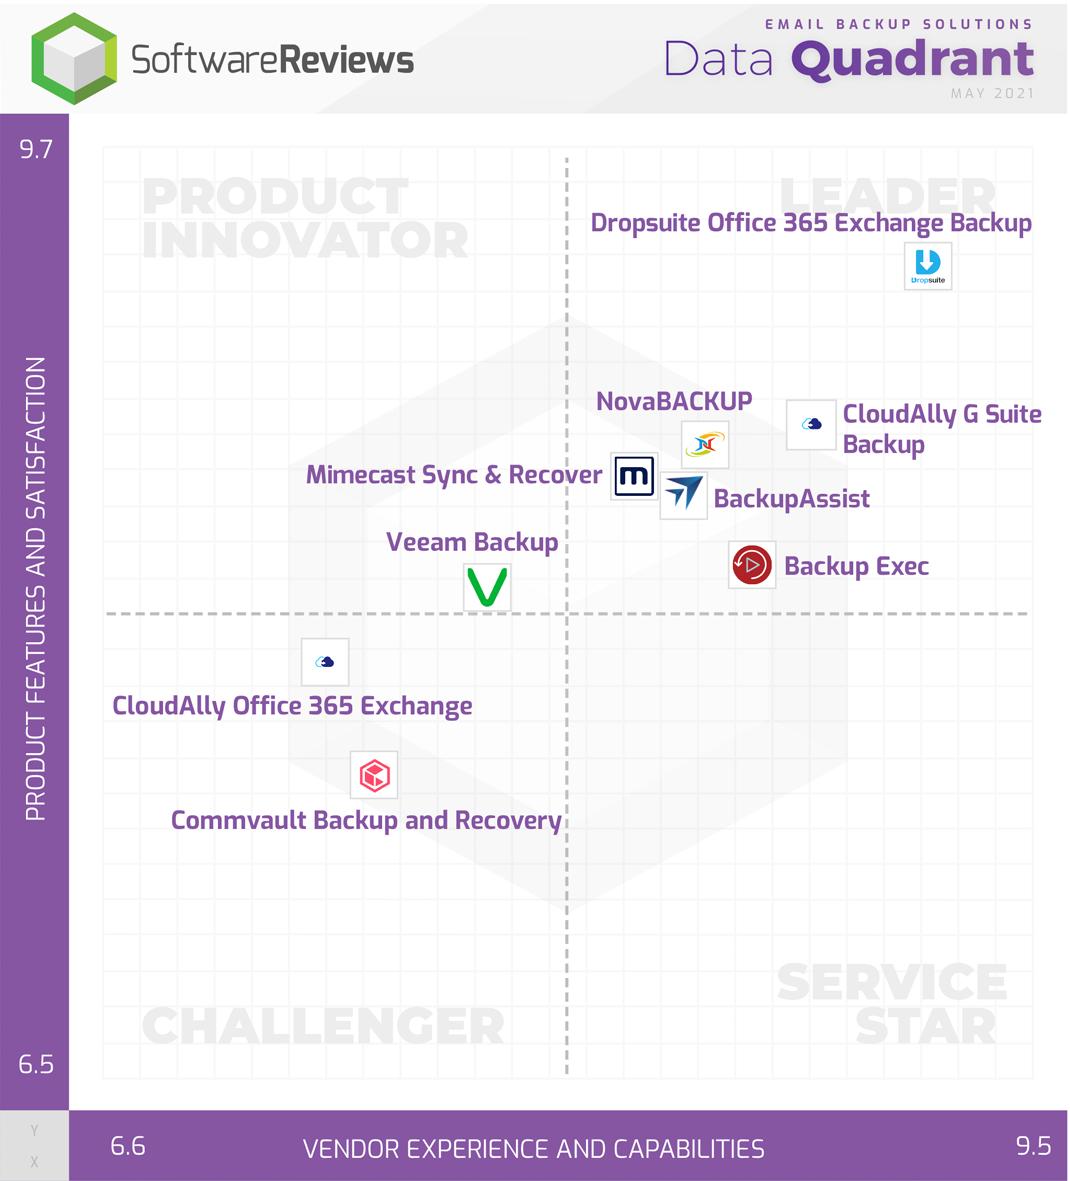 Email Backup Solutions Data Quadrant